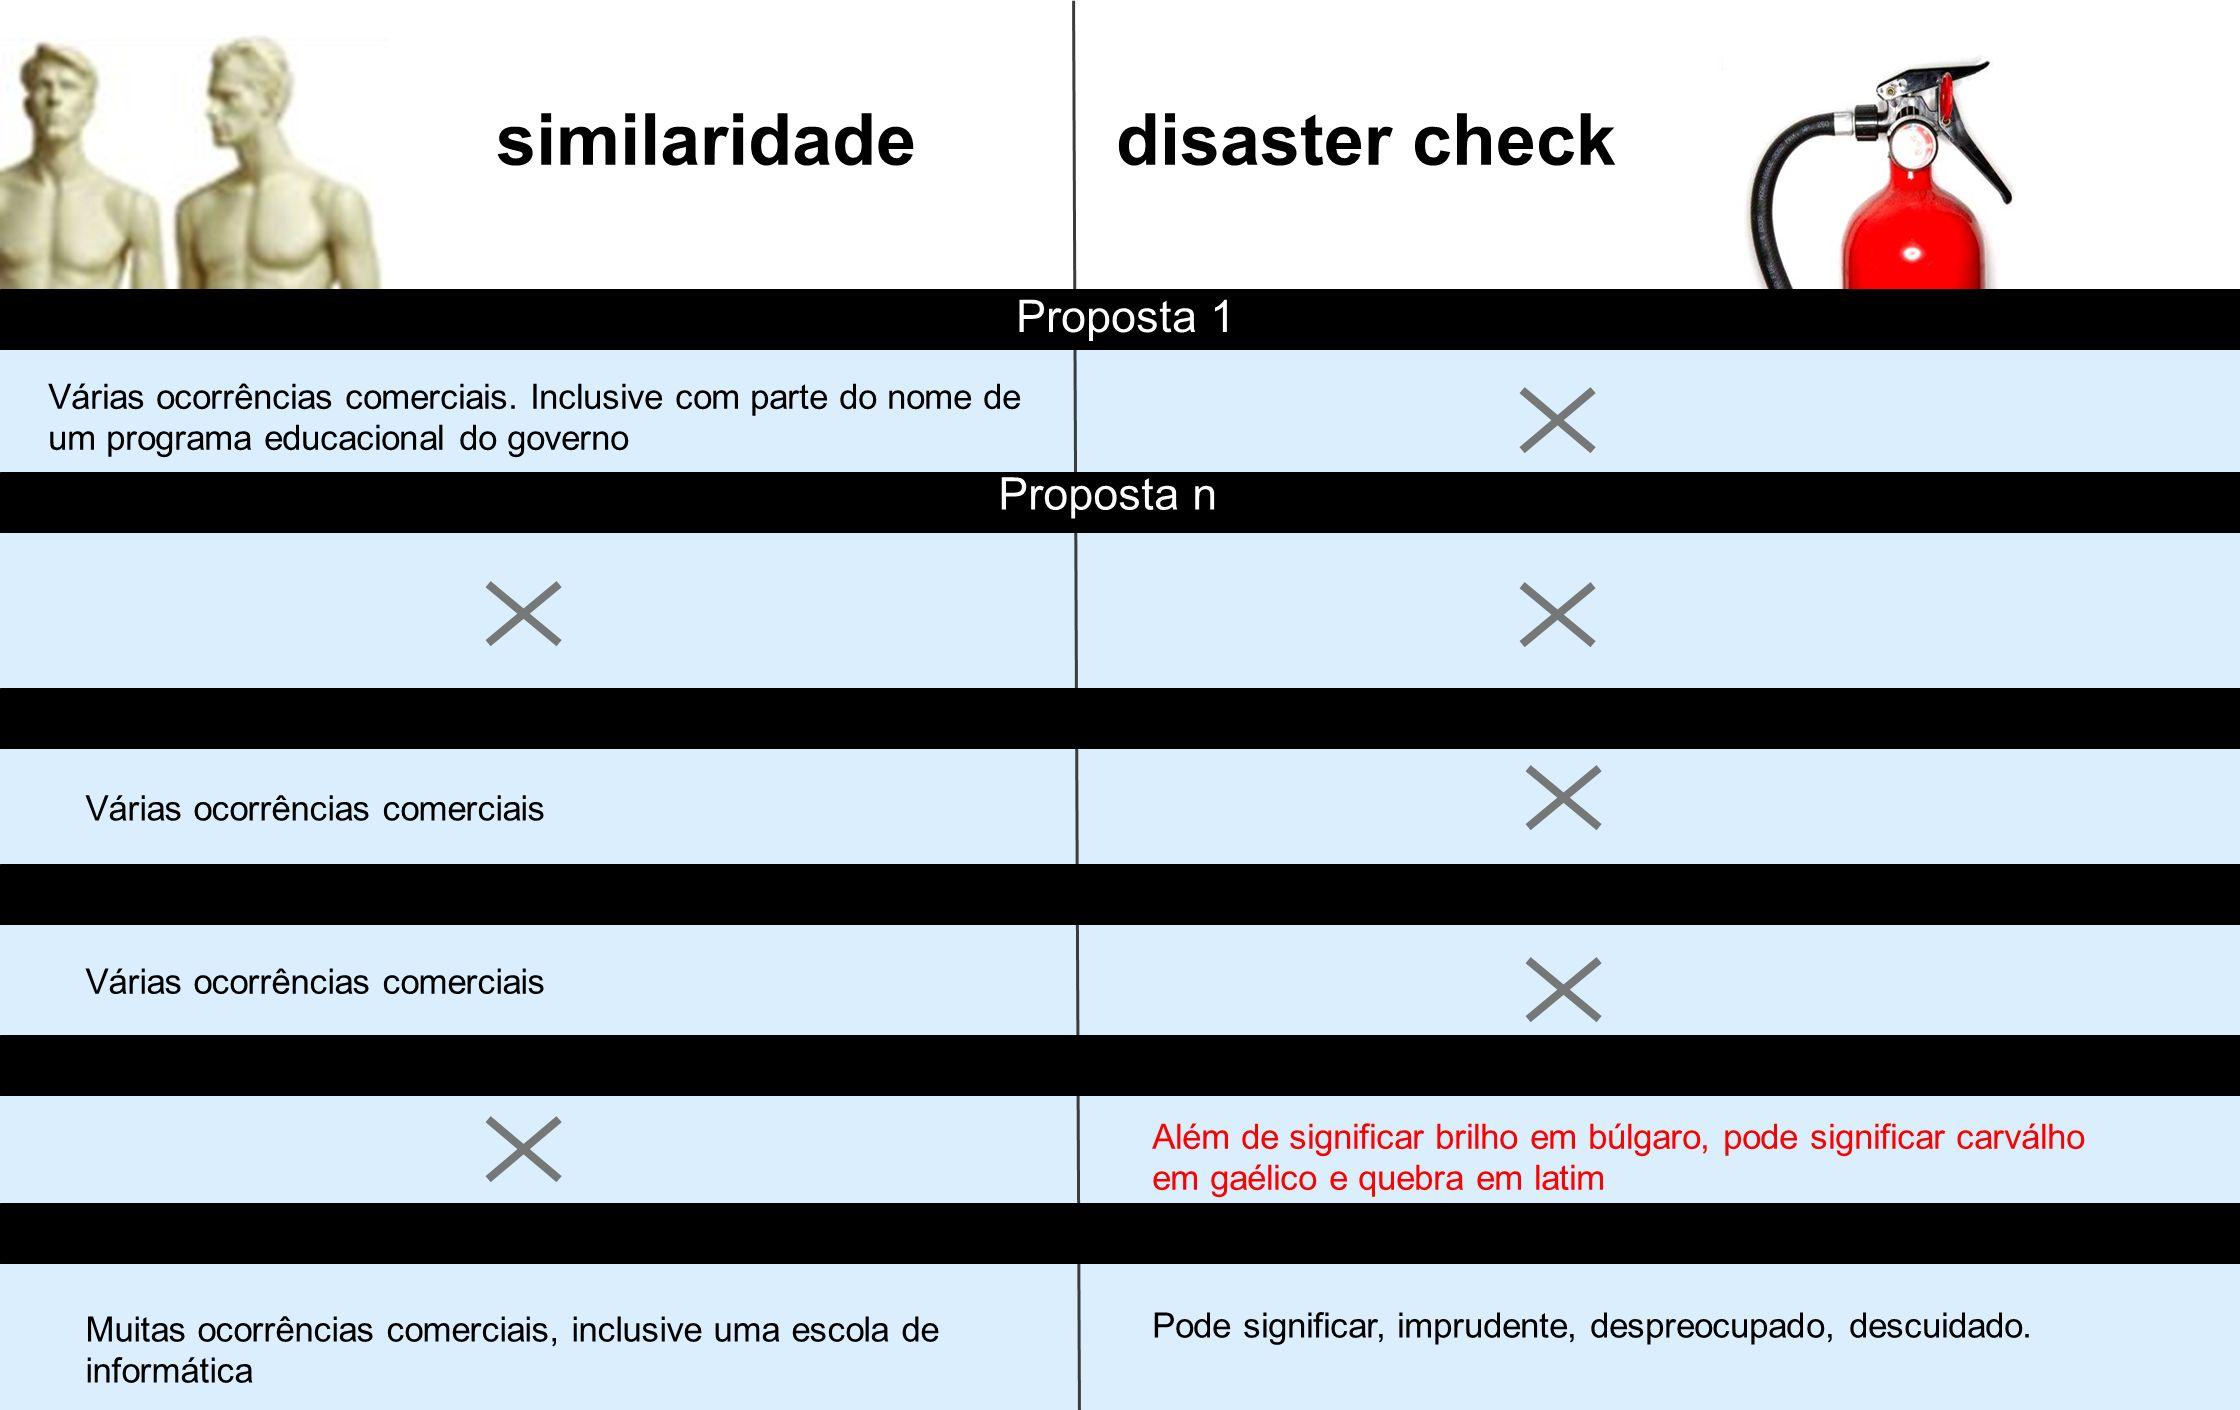 similaridade disaster check Proposta 1 Proposta n